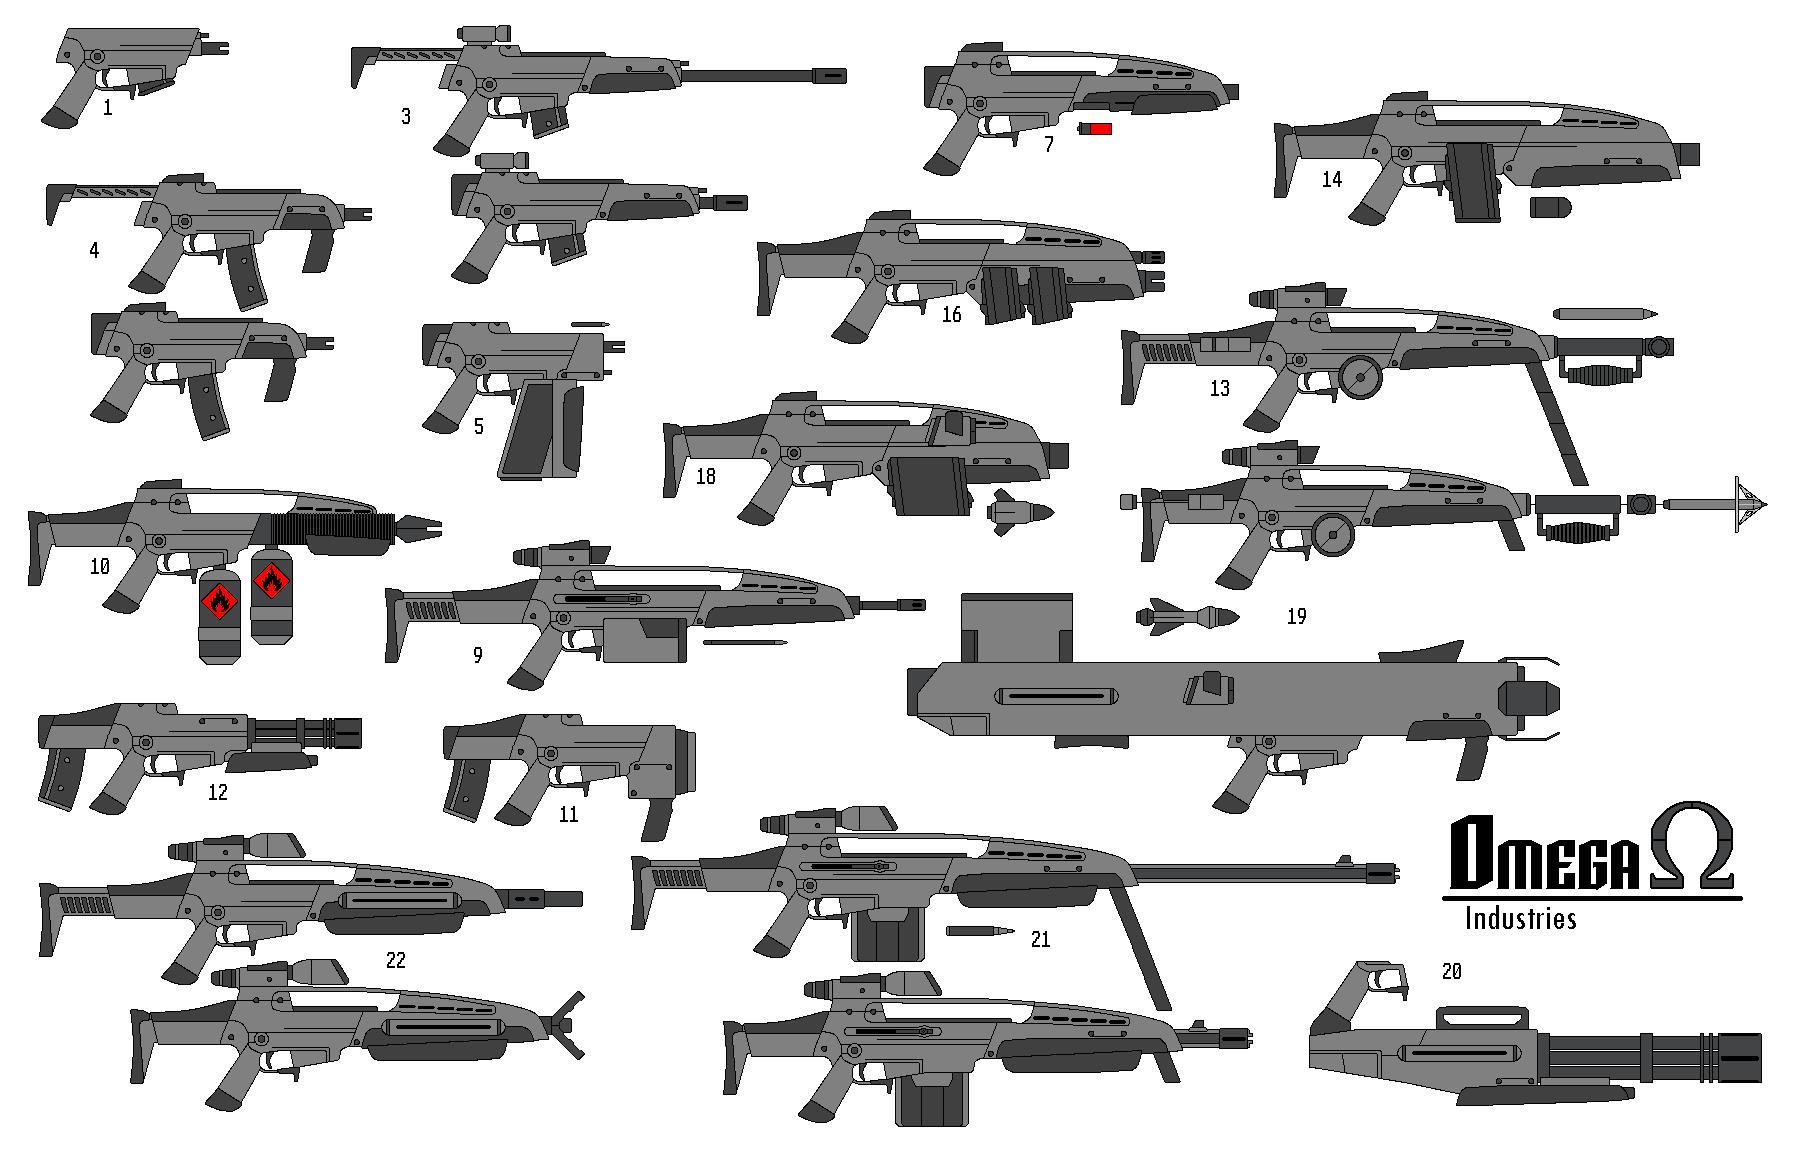 Drawn pistol awesome gun Guns omegafactor90 on guns omegafactor90